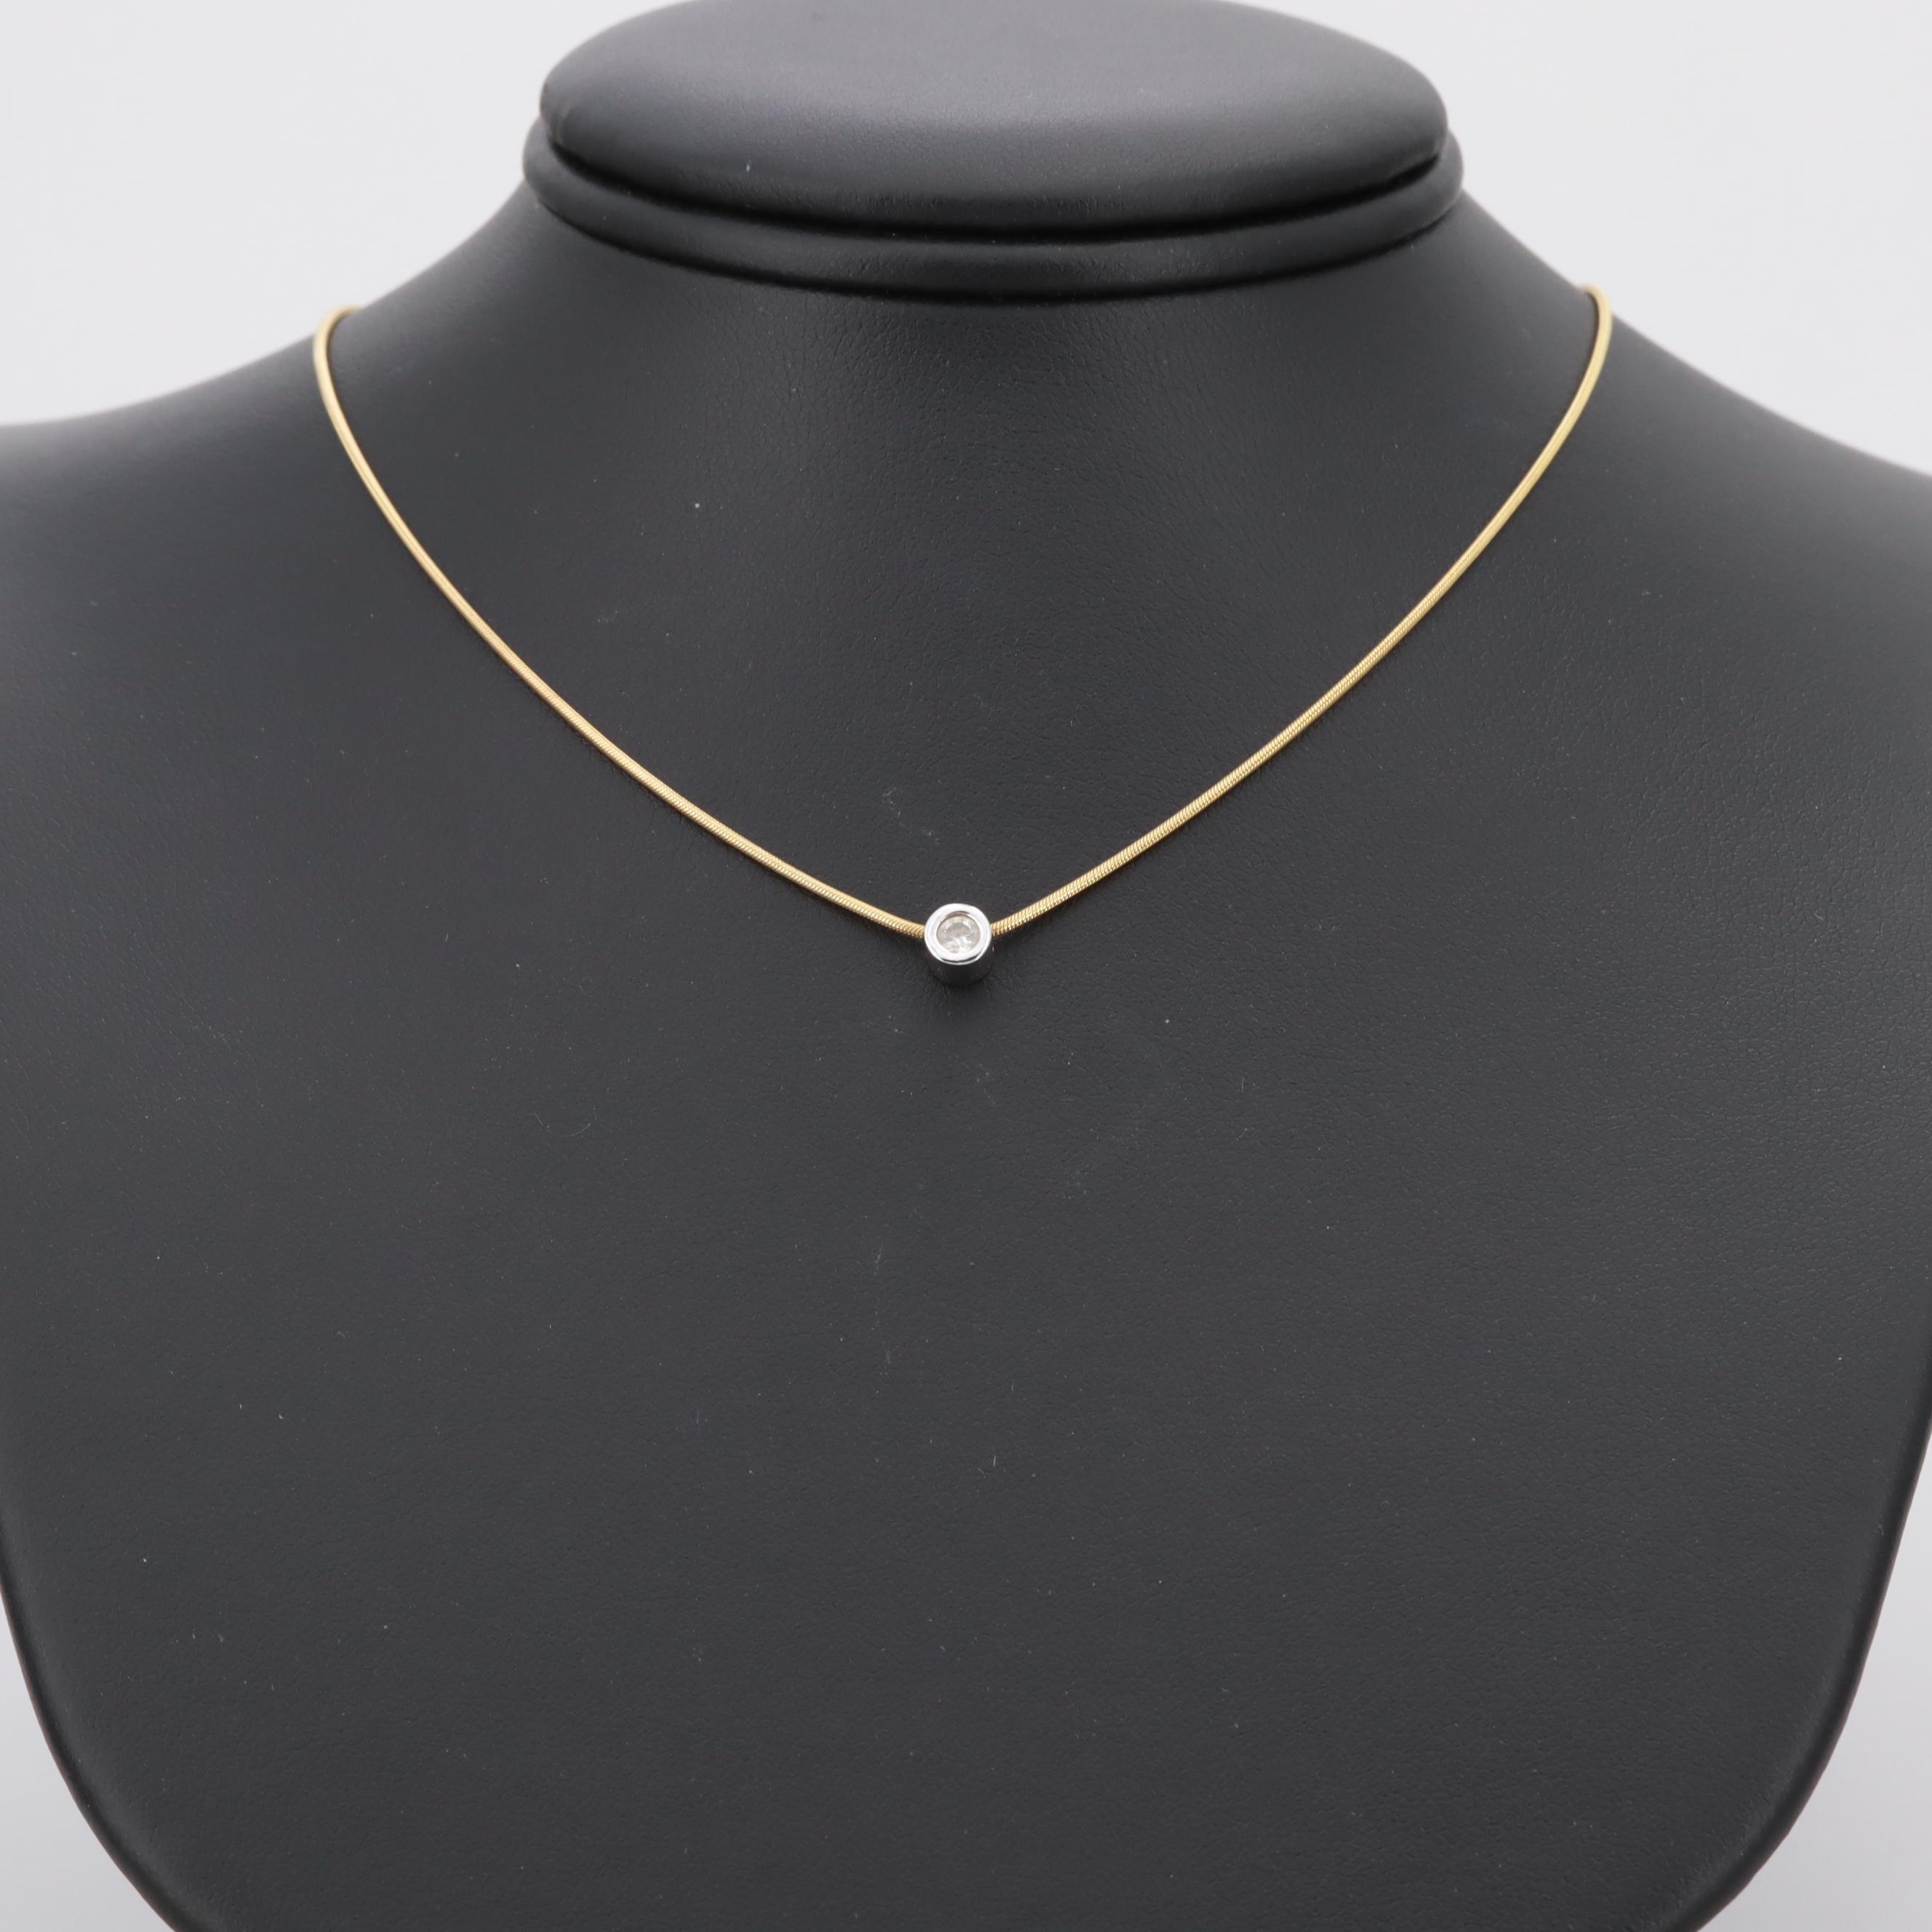 14K White and Yellow Gold Bezel Set Diamond Necklace